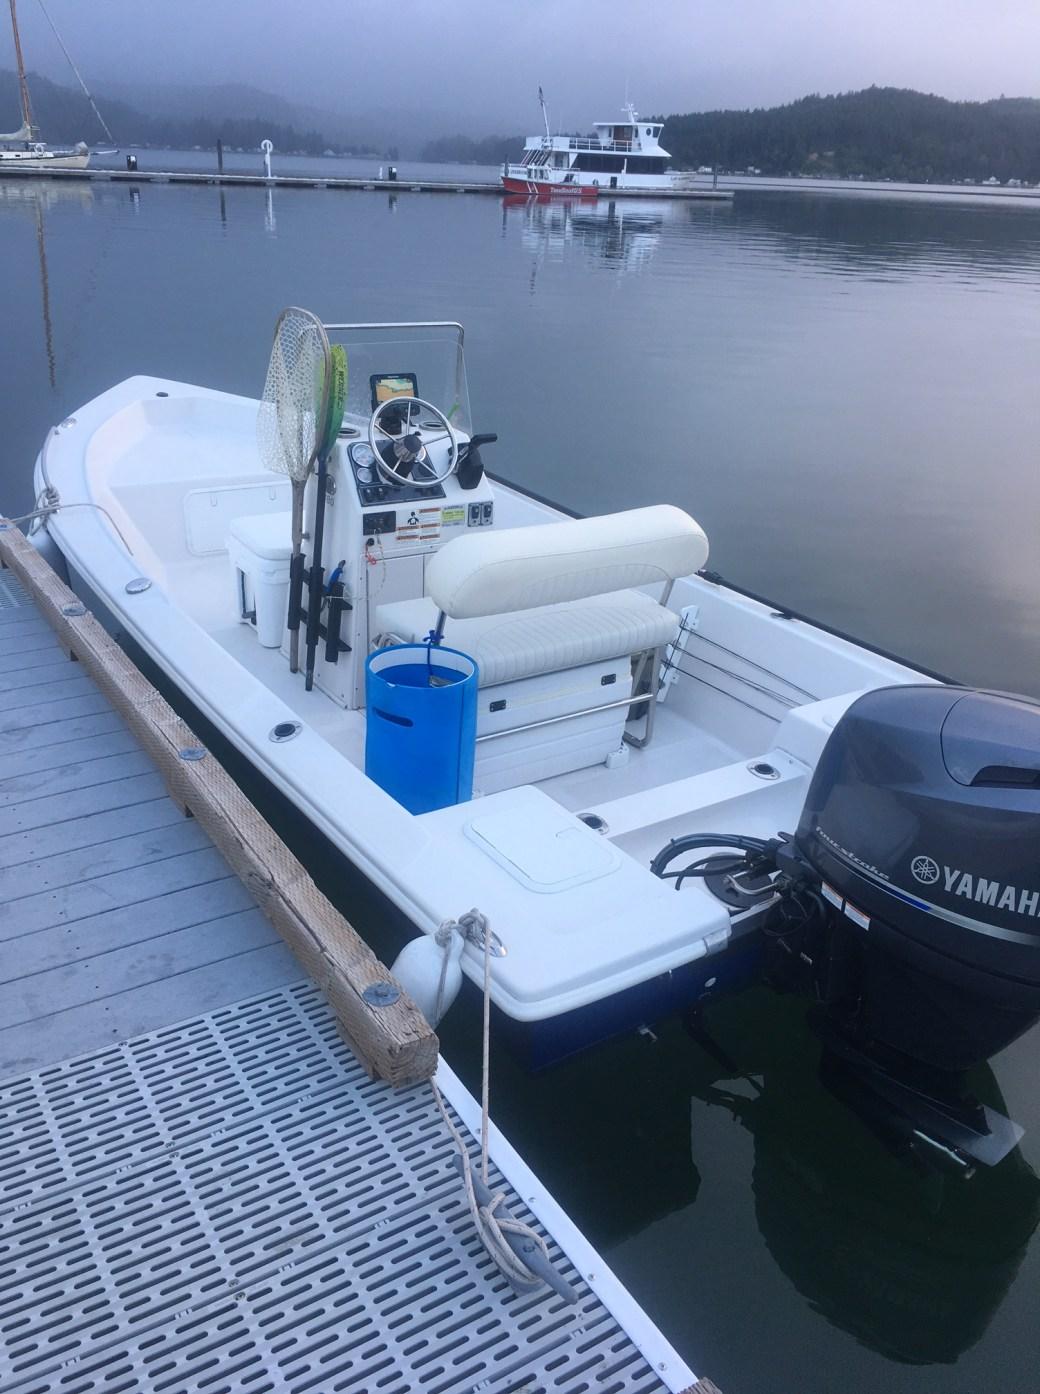 Boatdocked